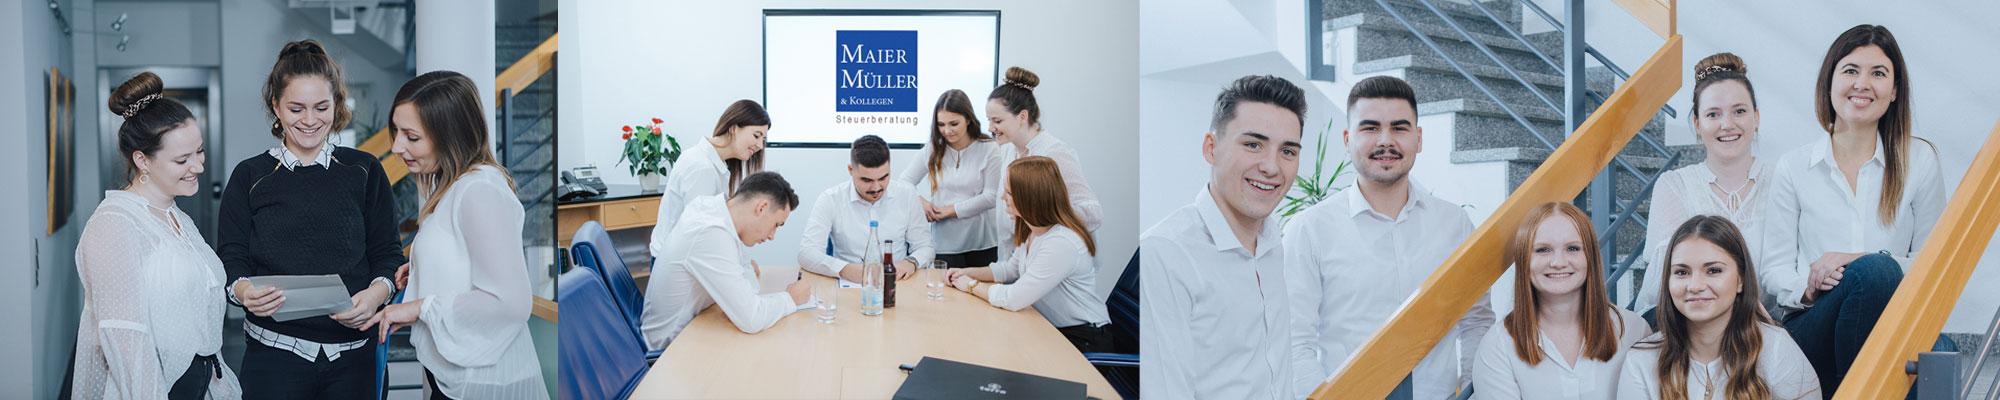 maier-mueller-kollegen-steuerberatung-waldshut-tiengen Karriere Ausbildung